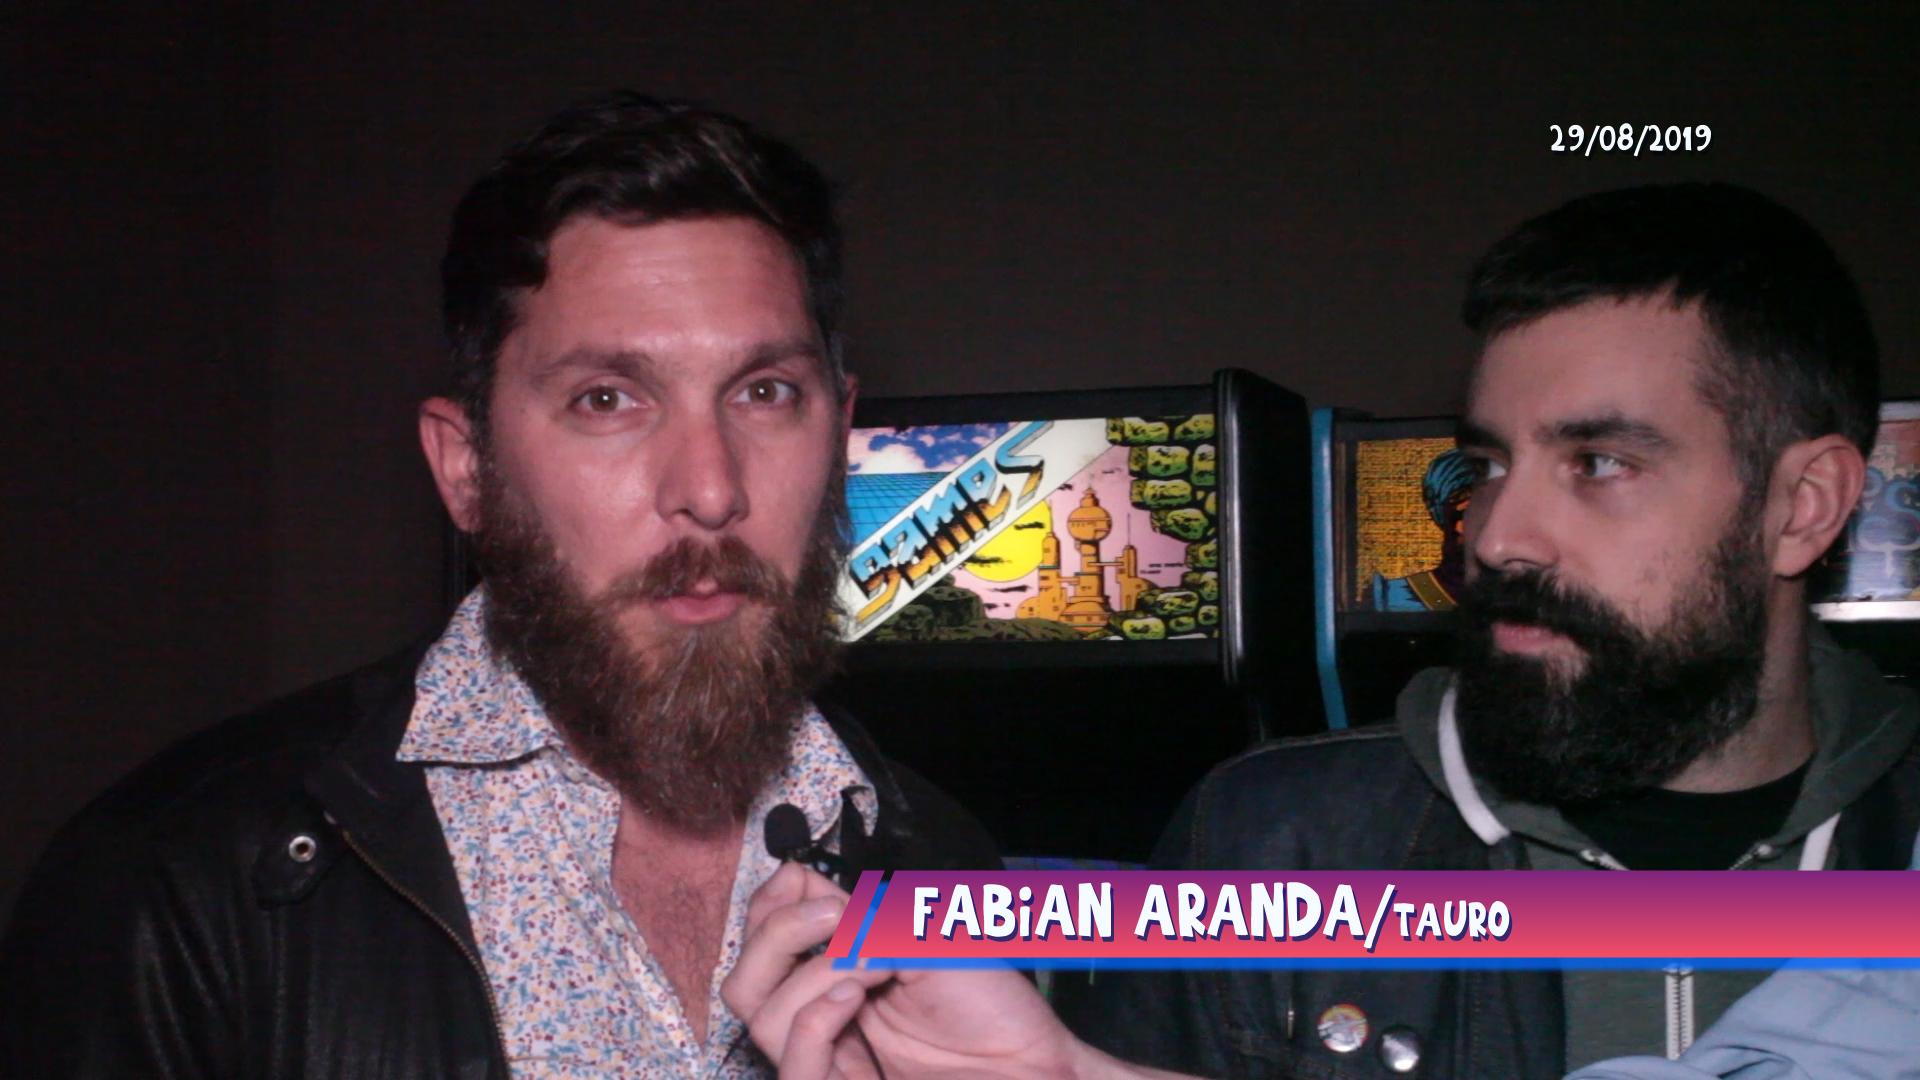 TAURO/ FABIAN ARANDA